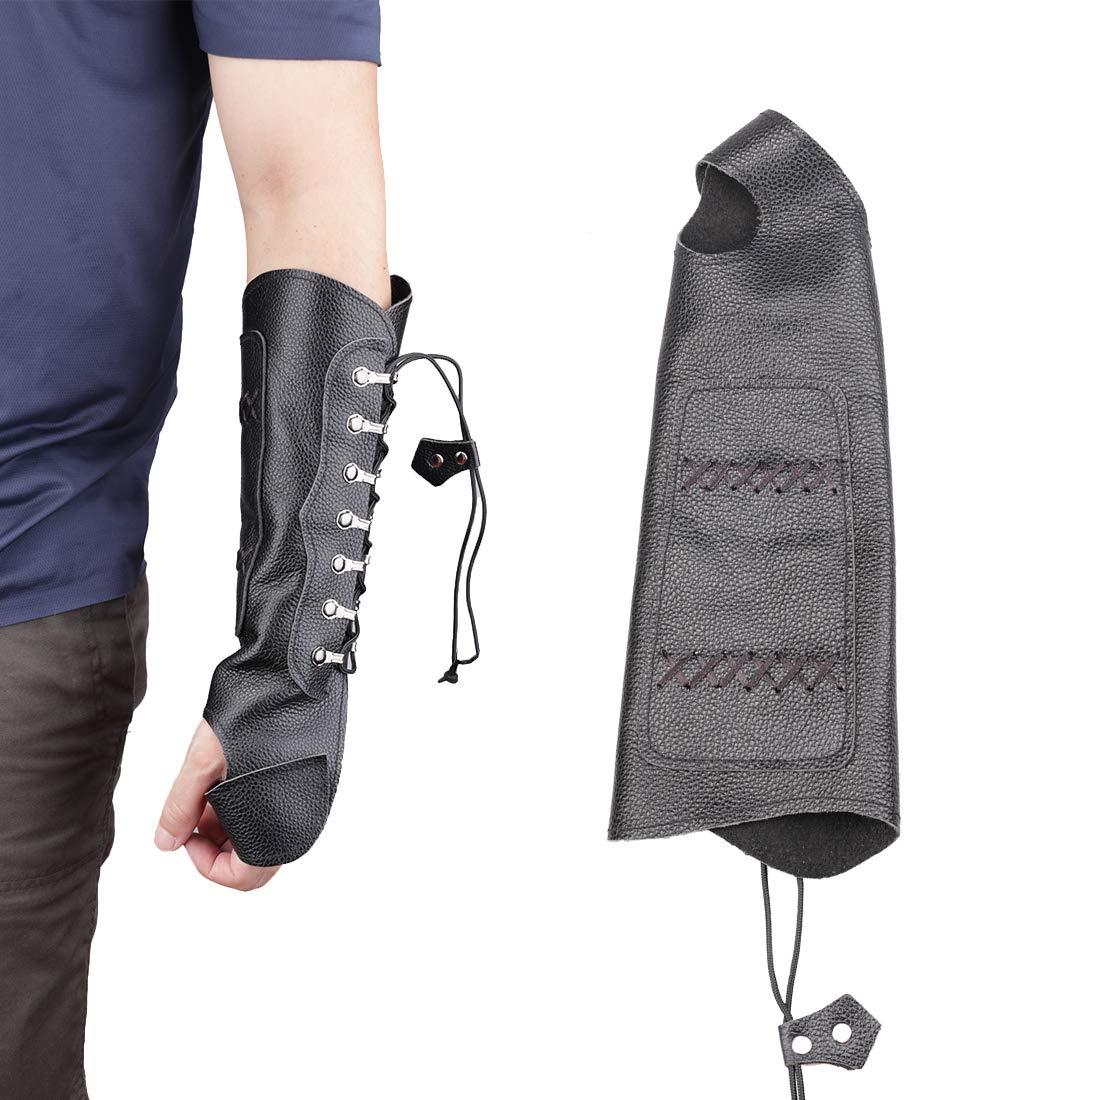 KRATARC アーチェリー レザー アームガード 保護 調整可能 アクセサリー 軽量 狩猟 ターゲット 射撃 大人 ユニセックス ブラック